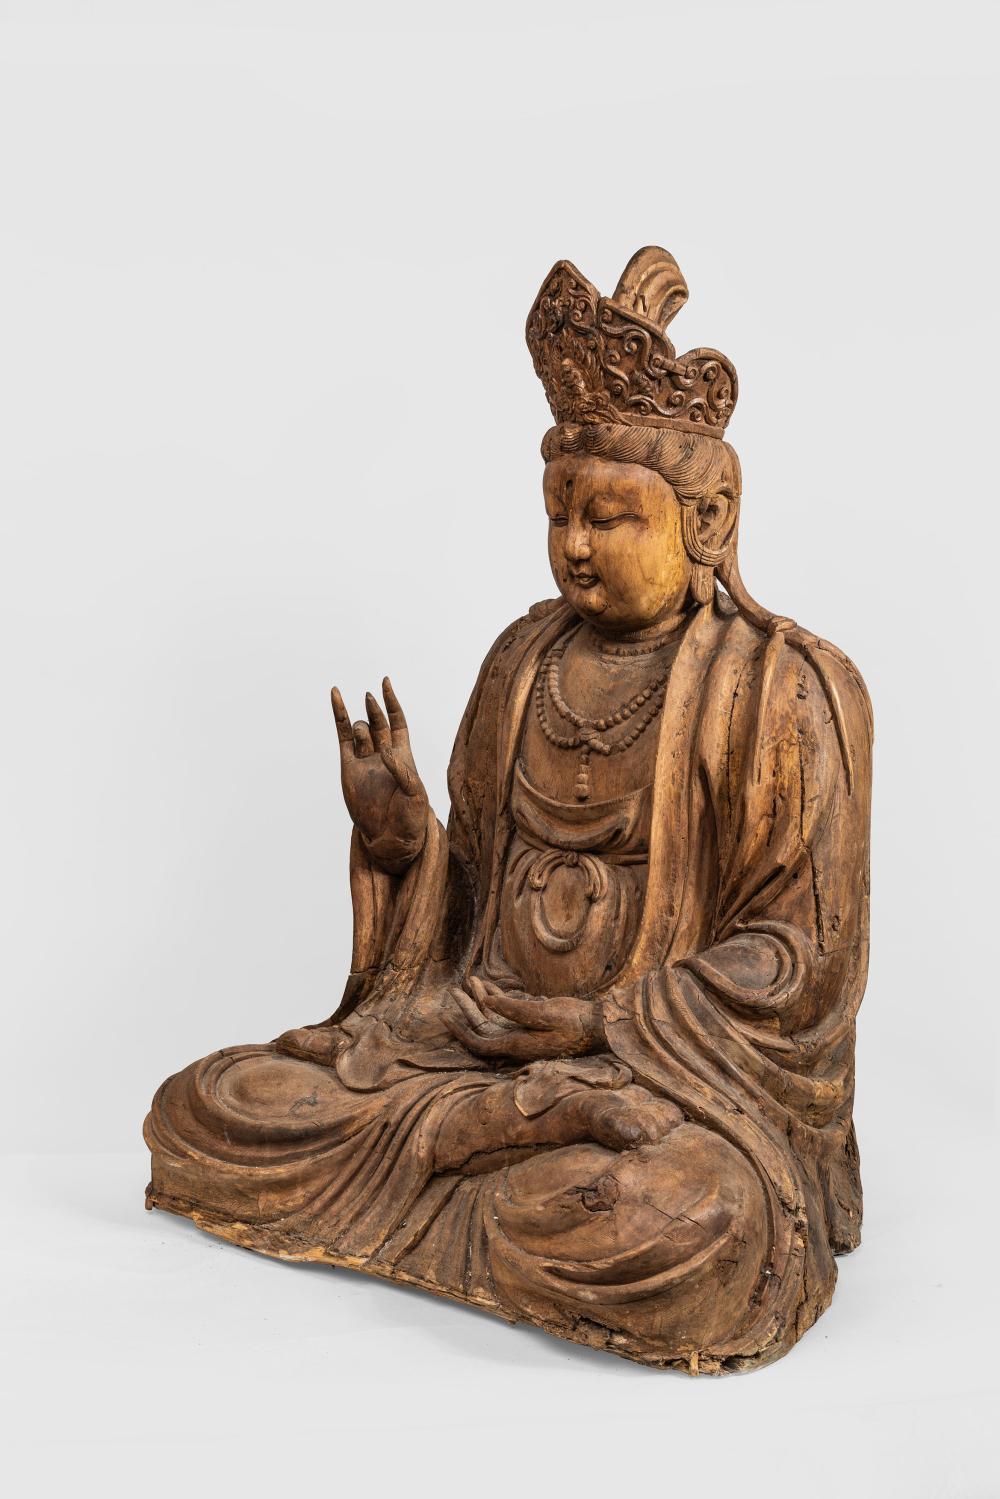 Le Boddhisattva Kwan Yin assis